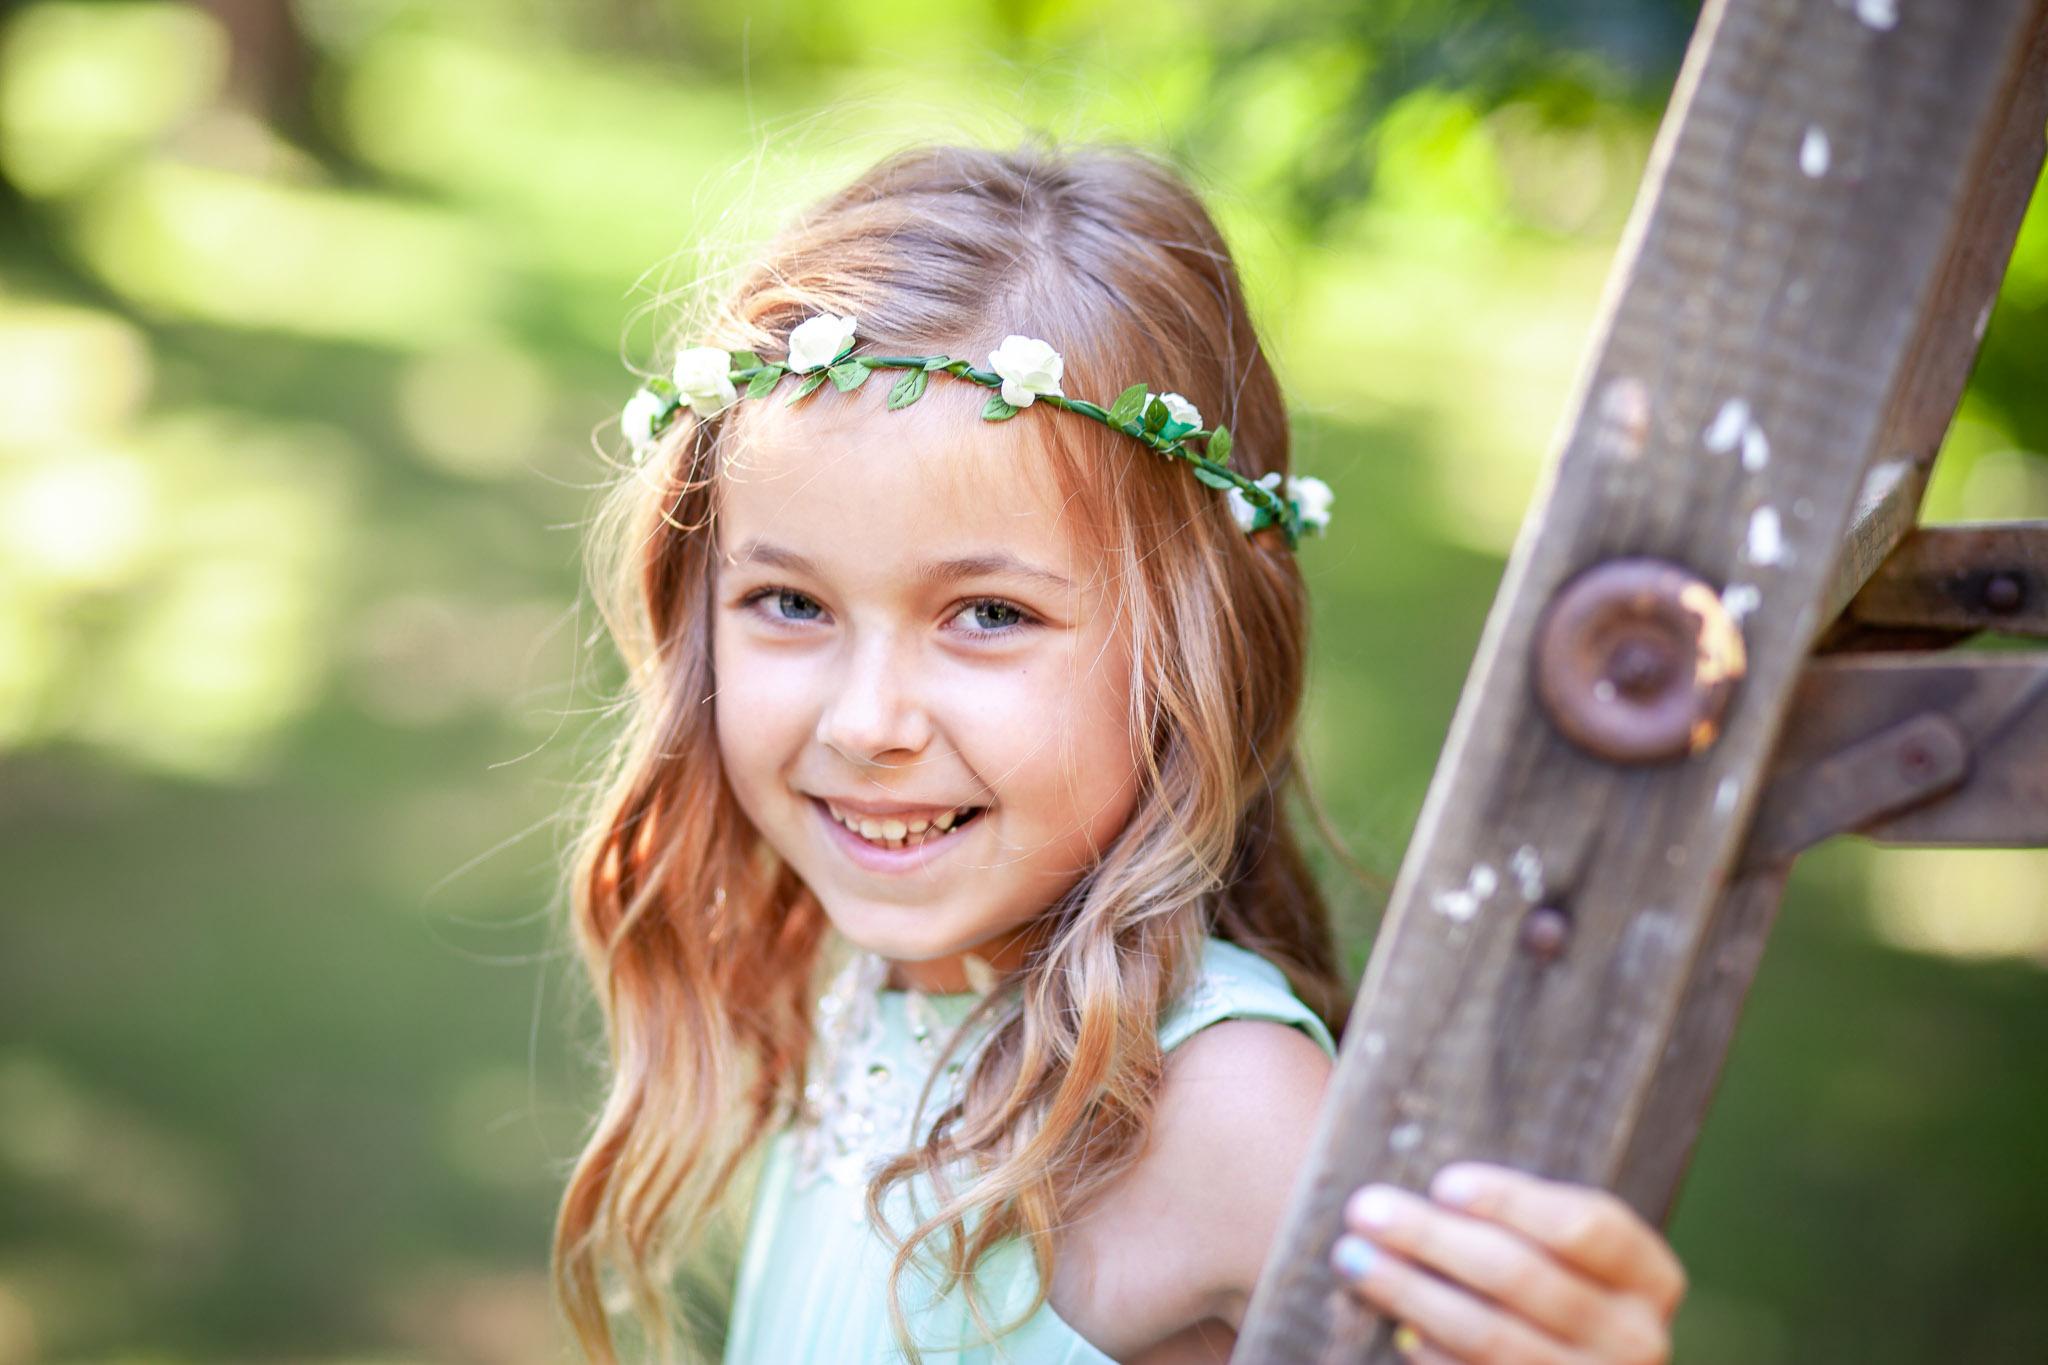 Amy D Photography- Family Photography- Unicorn Mini Sessions- Unicorn Photo Session- Childrens Mini Session - Little Girl Photo Session- Whimisical-26.jpg